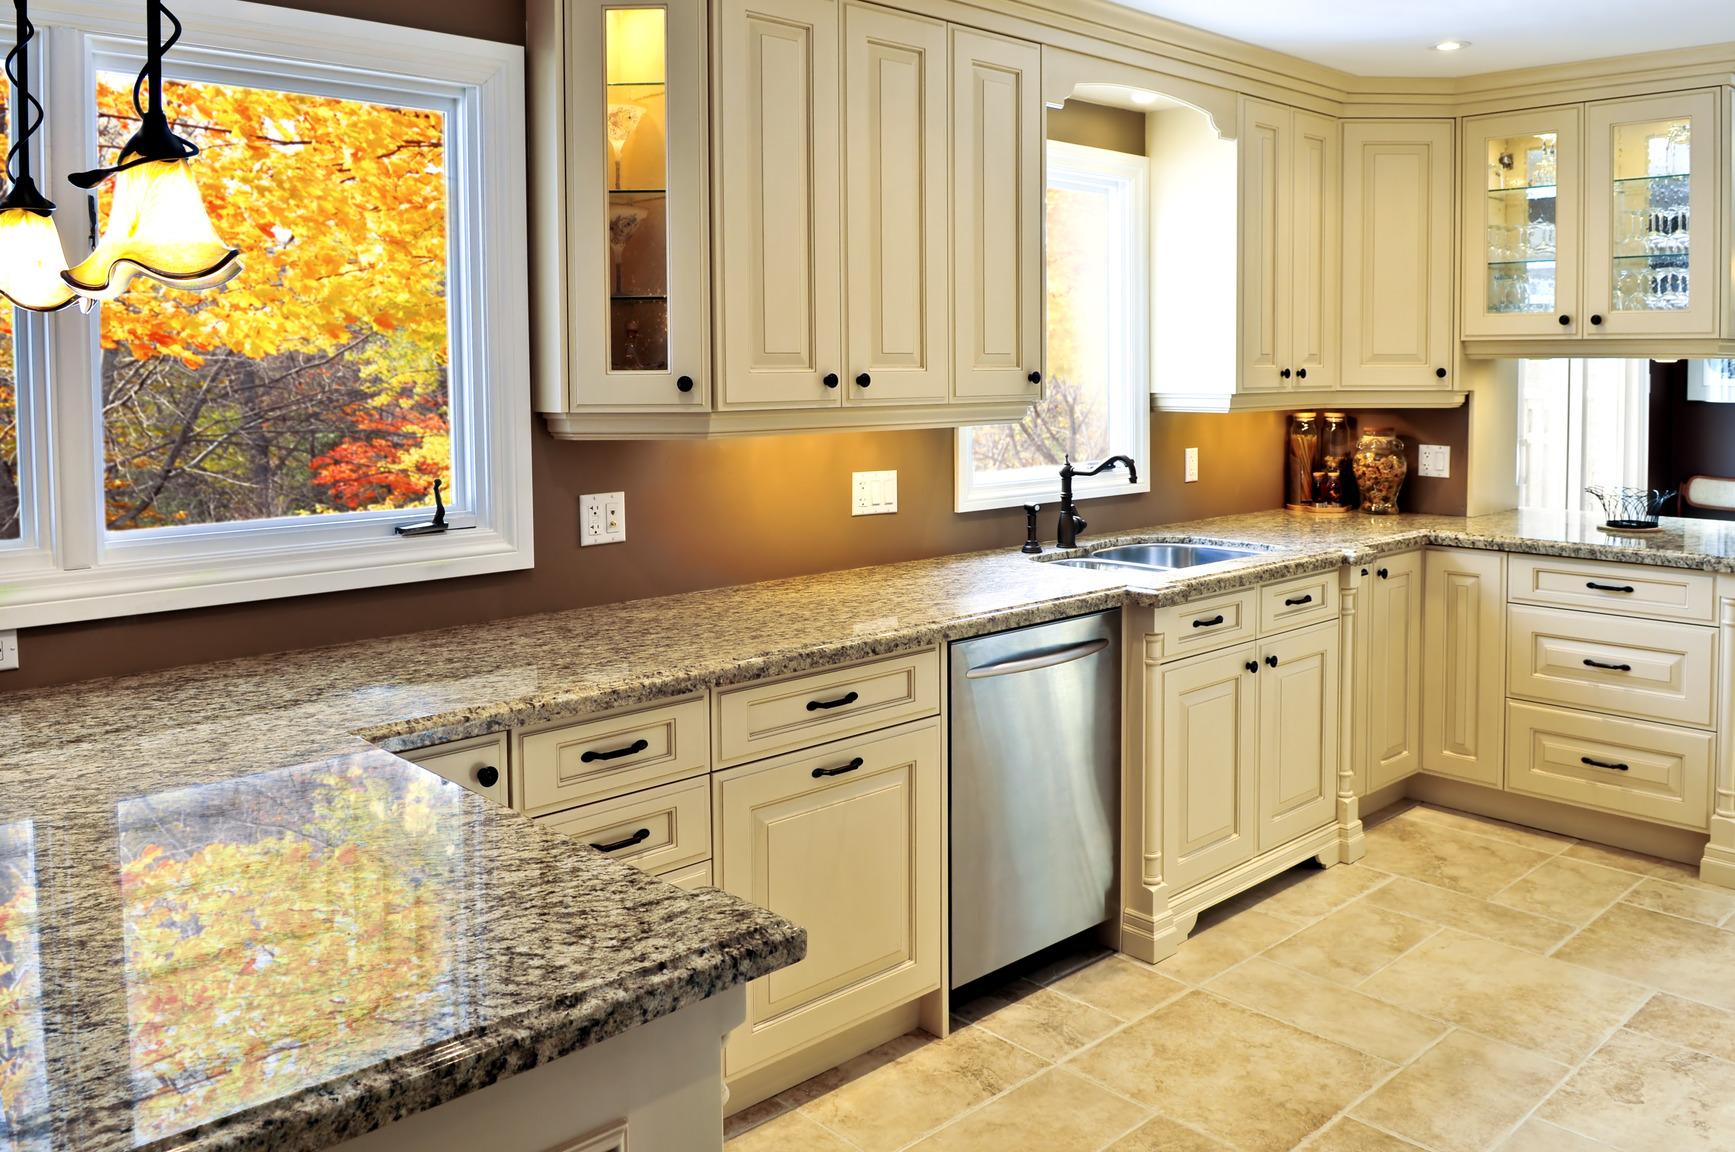 Kitchen Remodeling in Fairfax Station VA